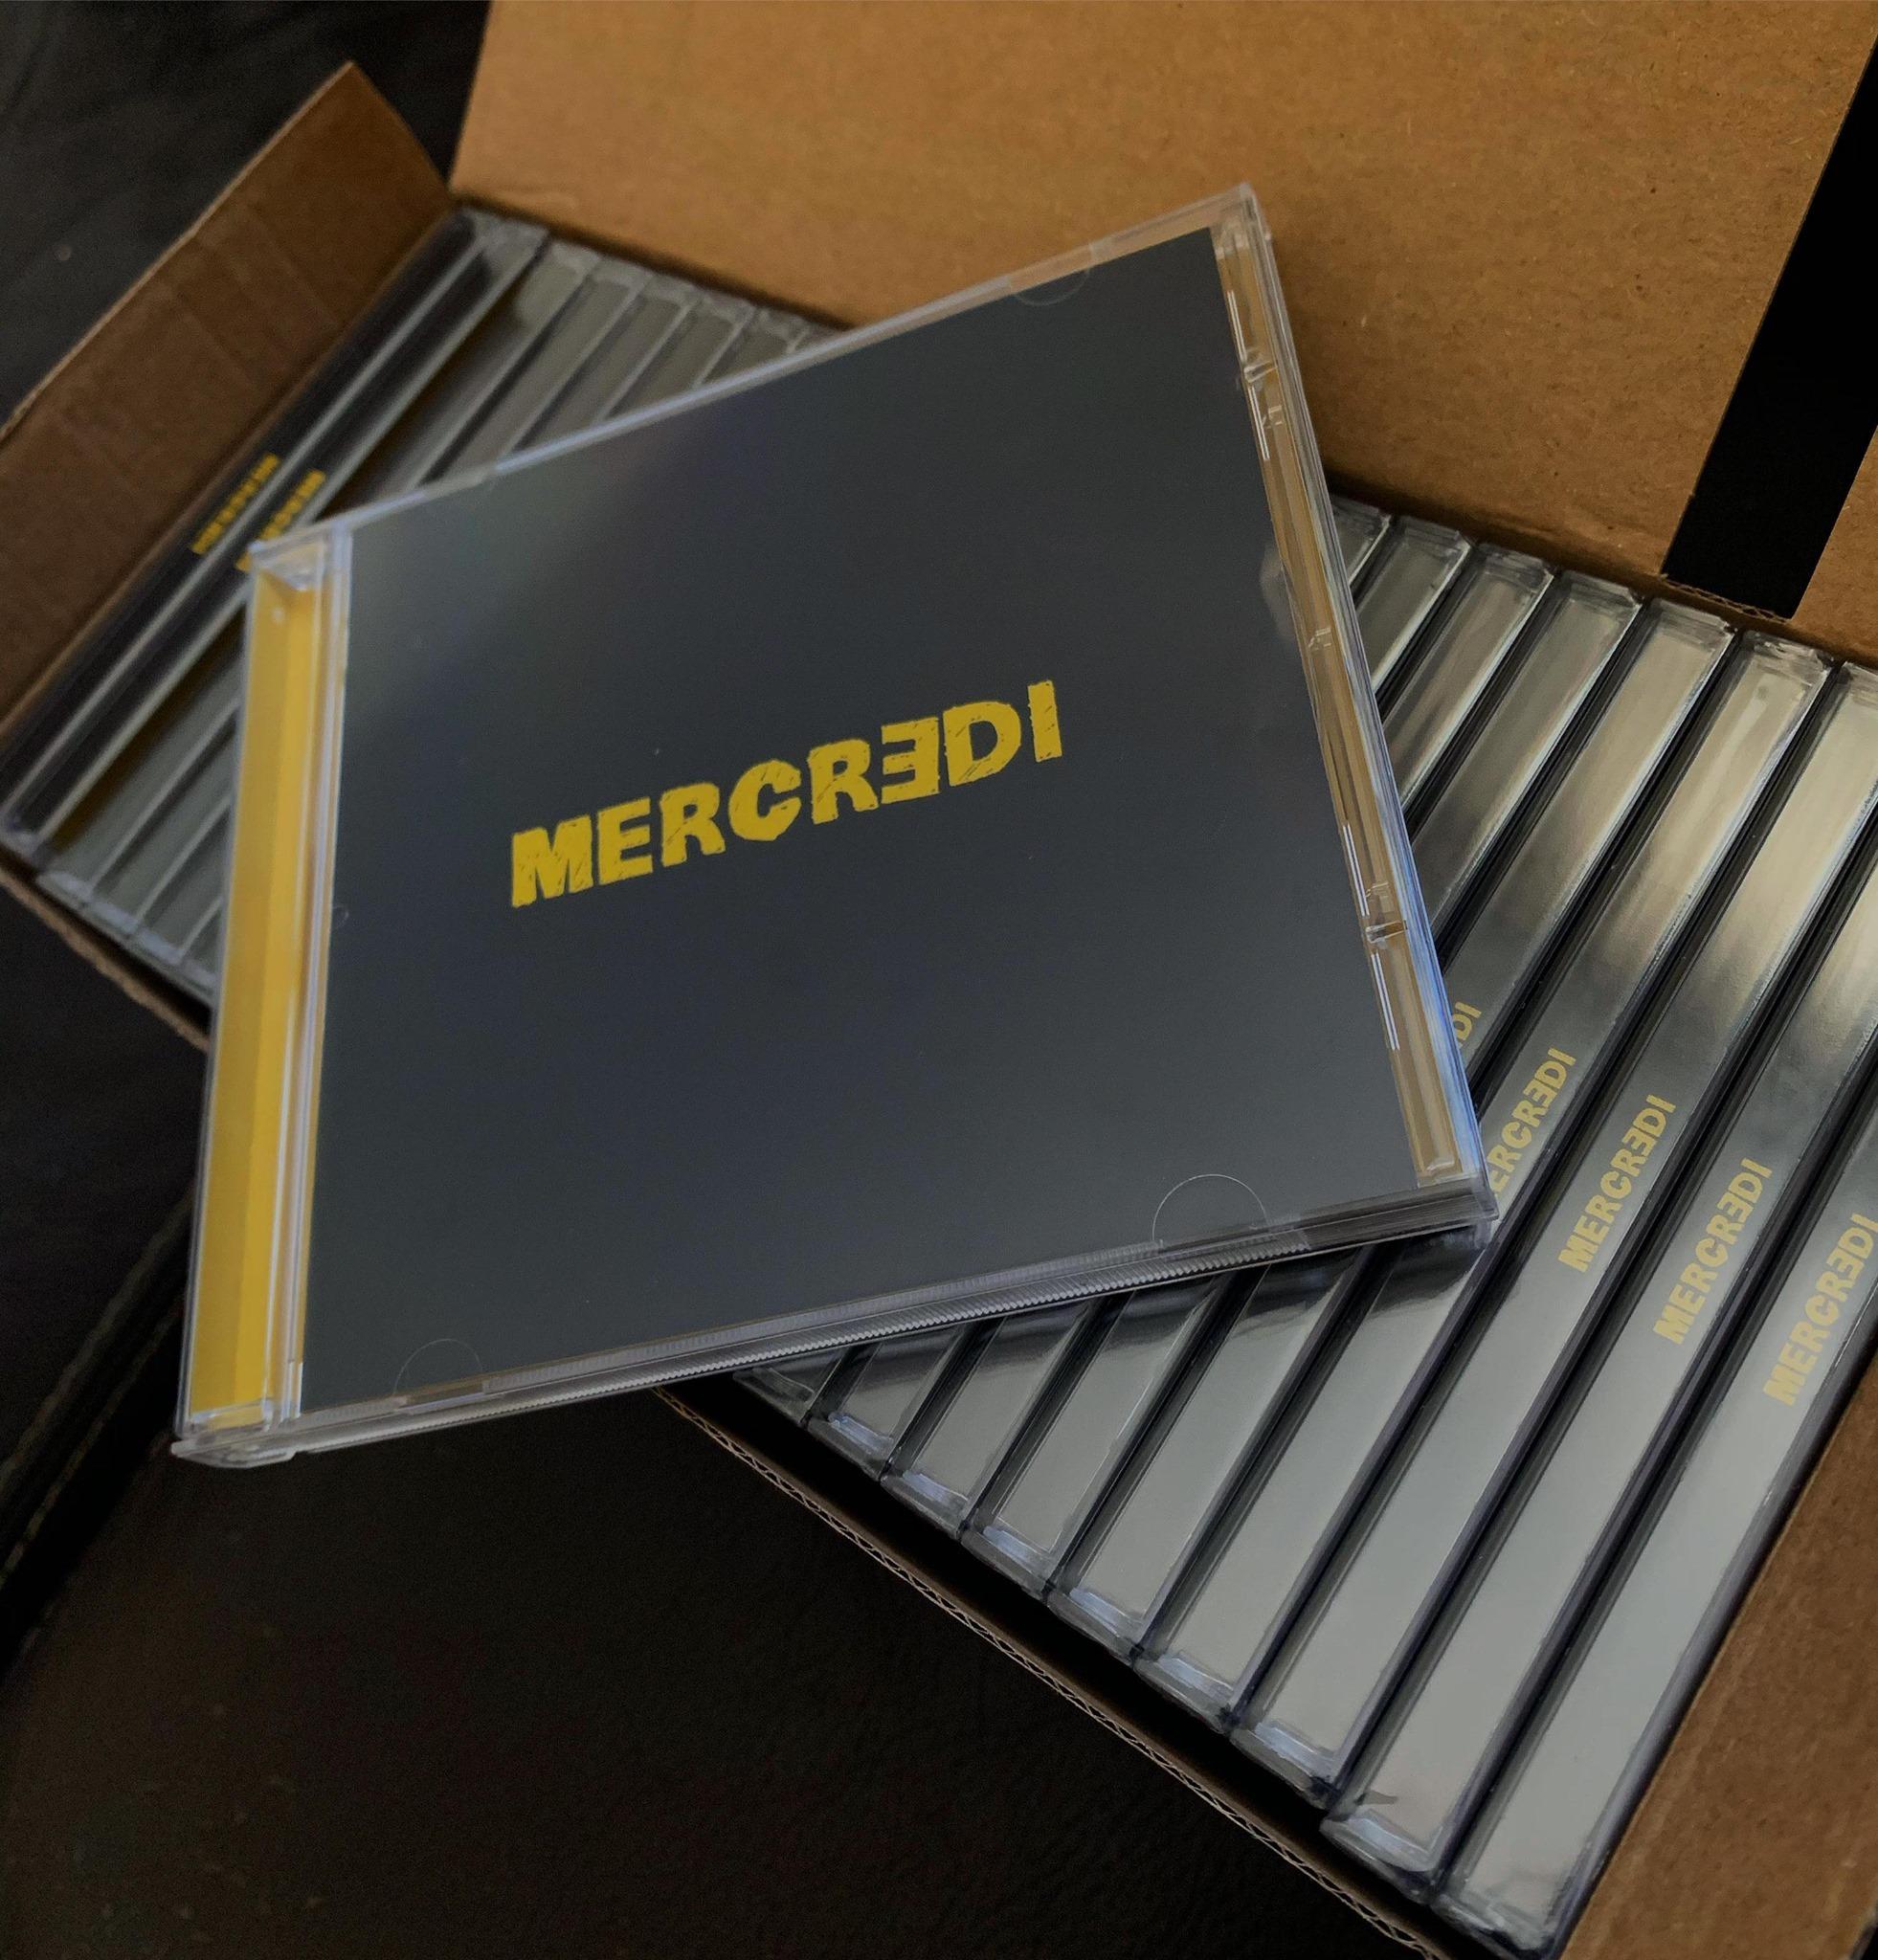 Mercredi - CD